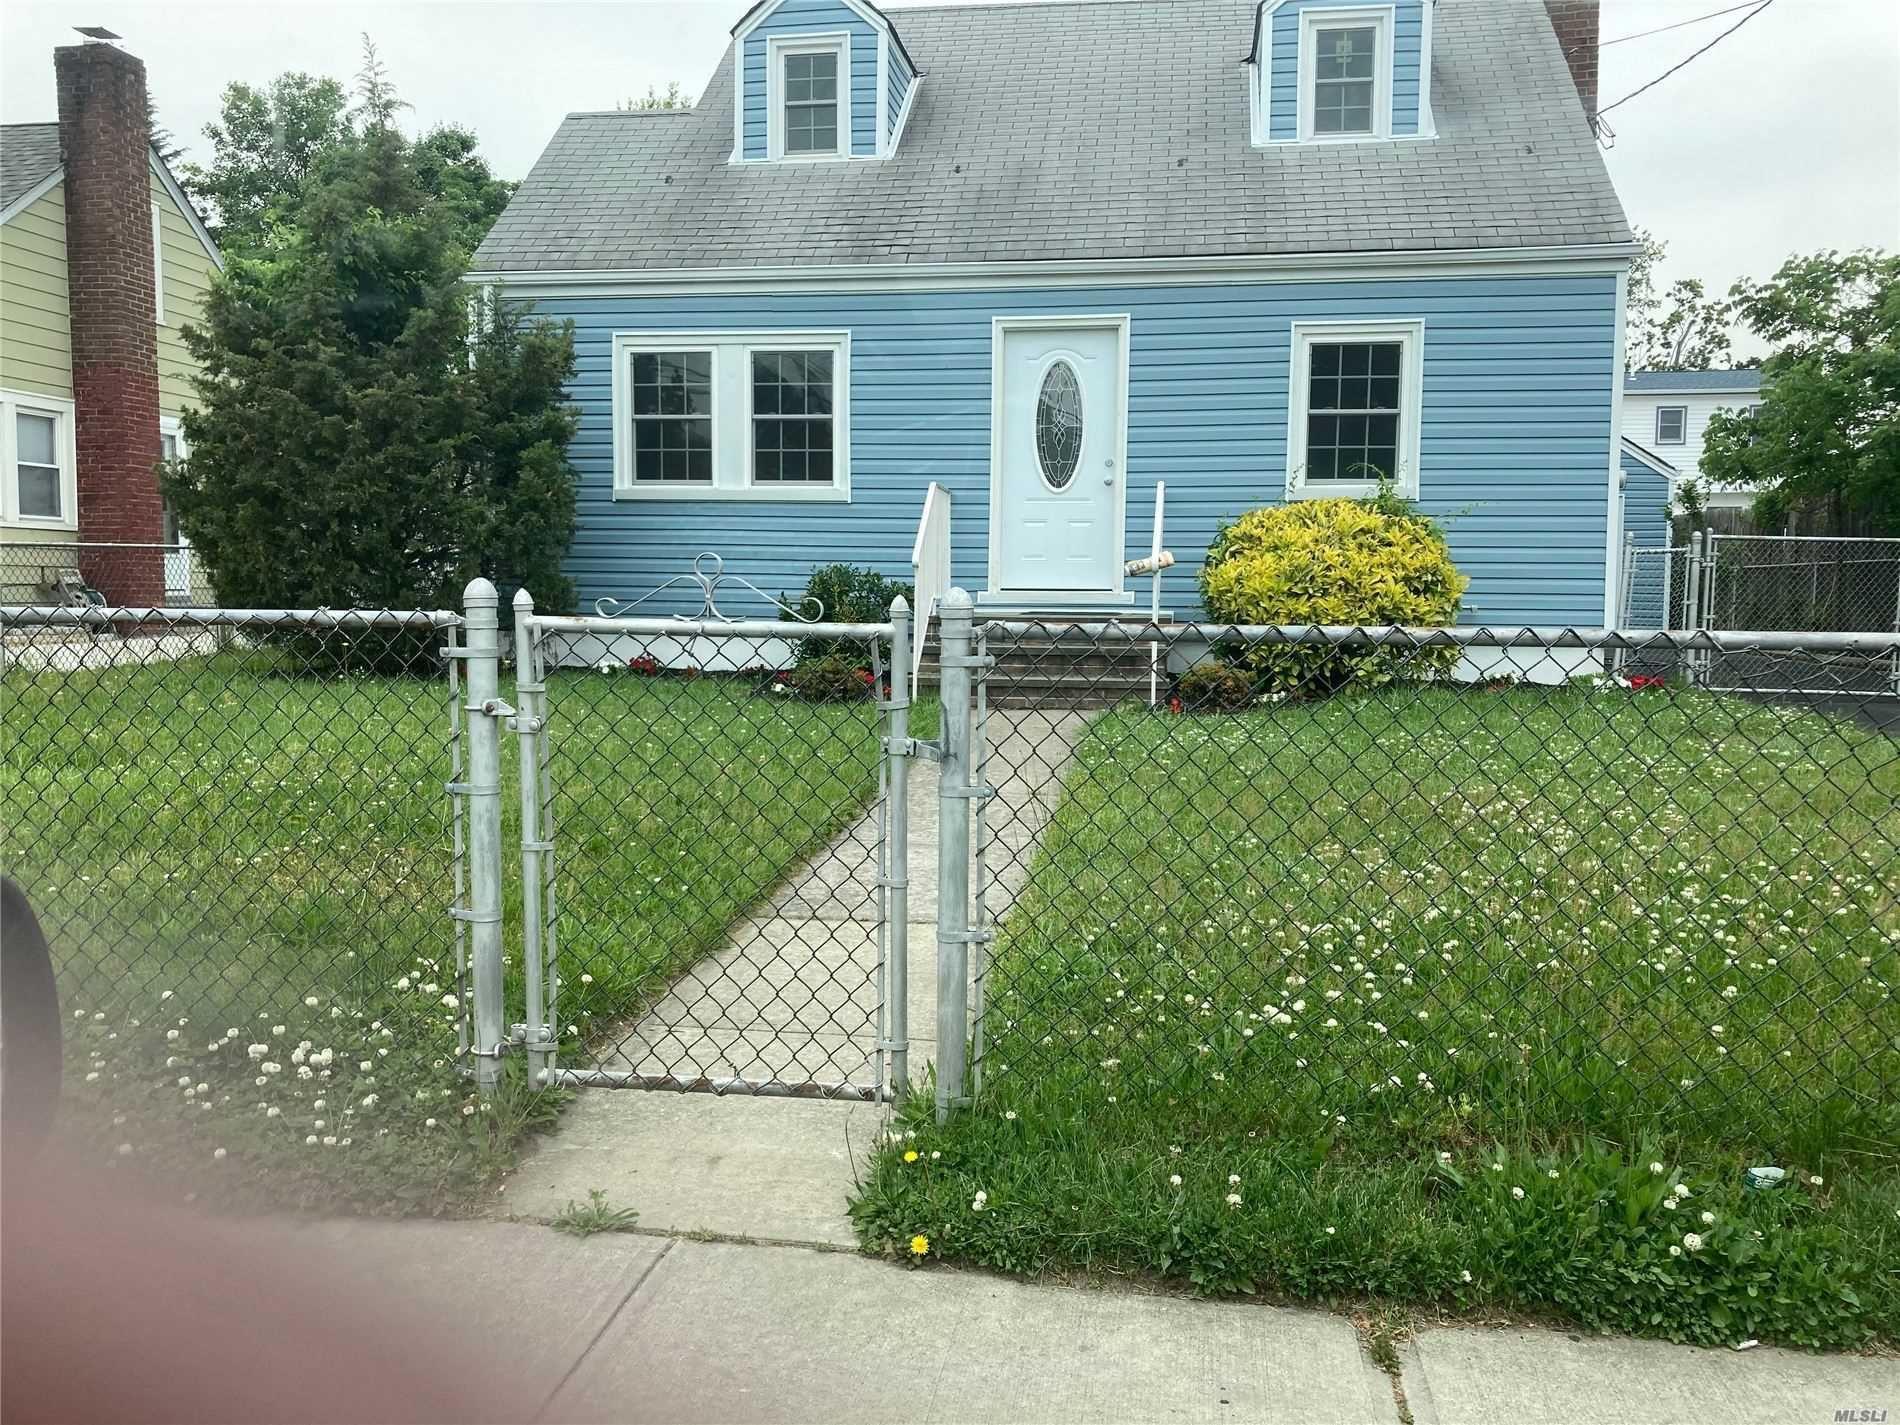 1806 Newbridge Road, Bellmore, NY 11710 - MLS#: 3219880